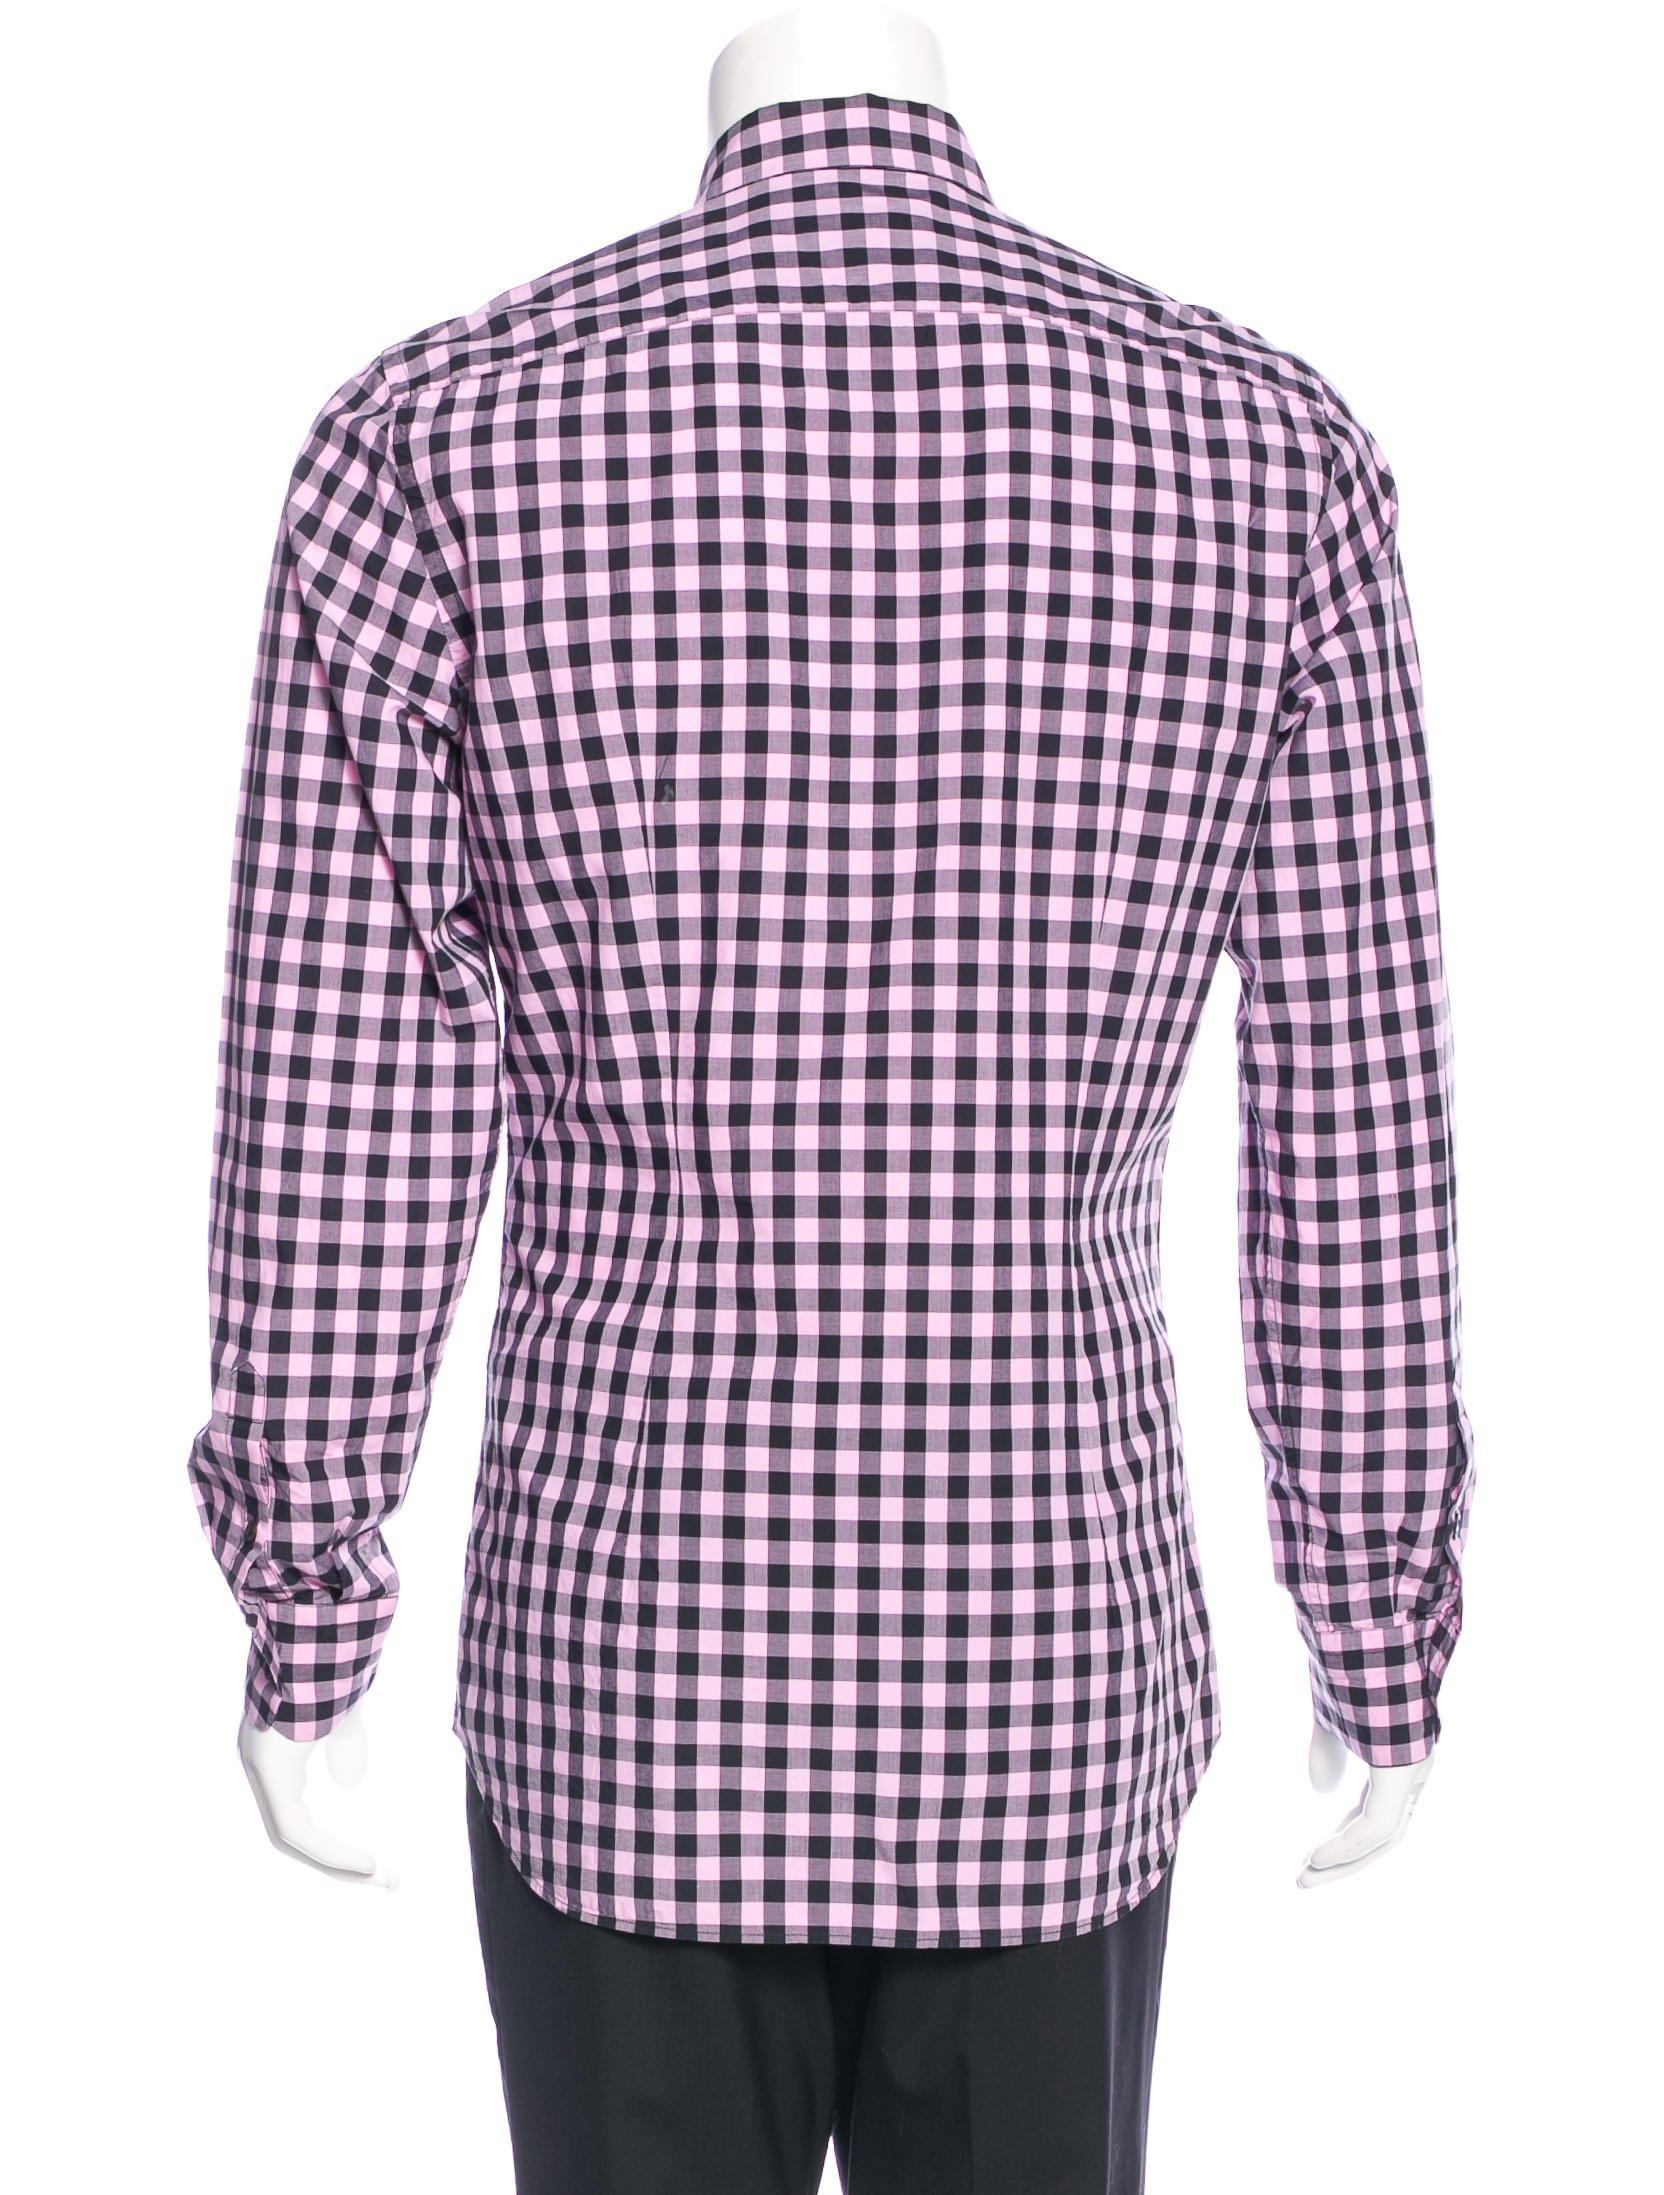 Prada gingham dress shirt clothing pra140887 the for Men s red gingham dress shirt